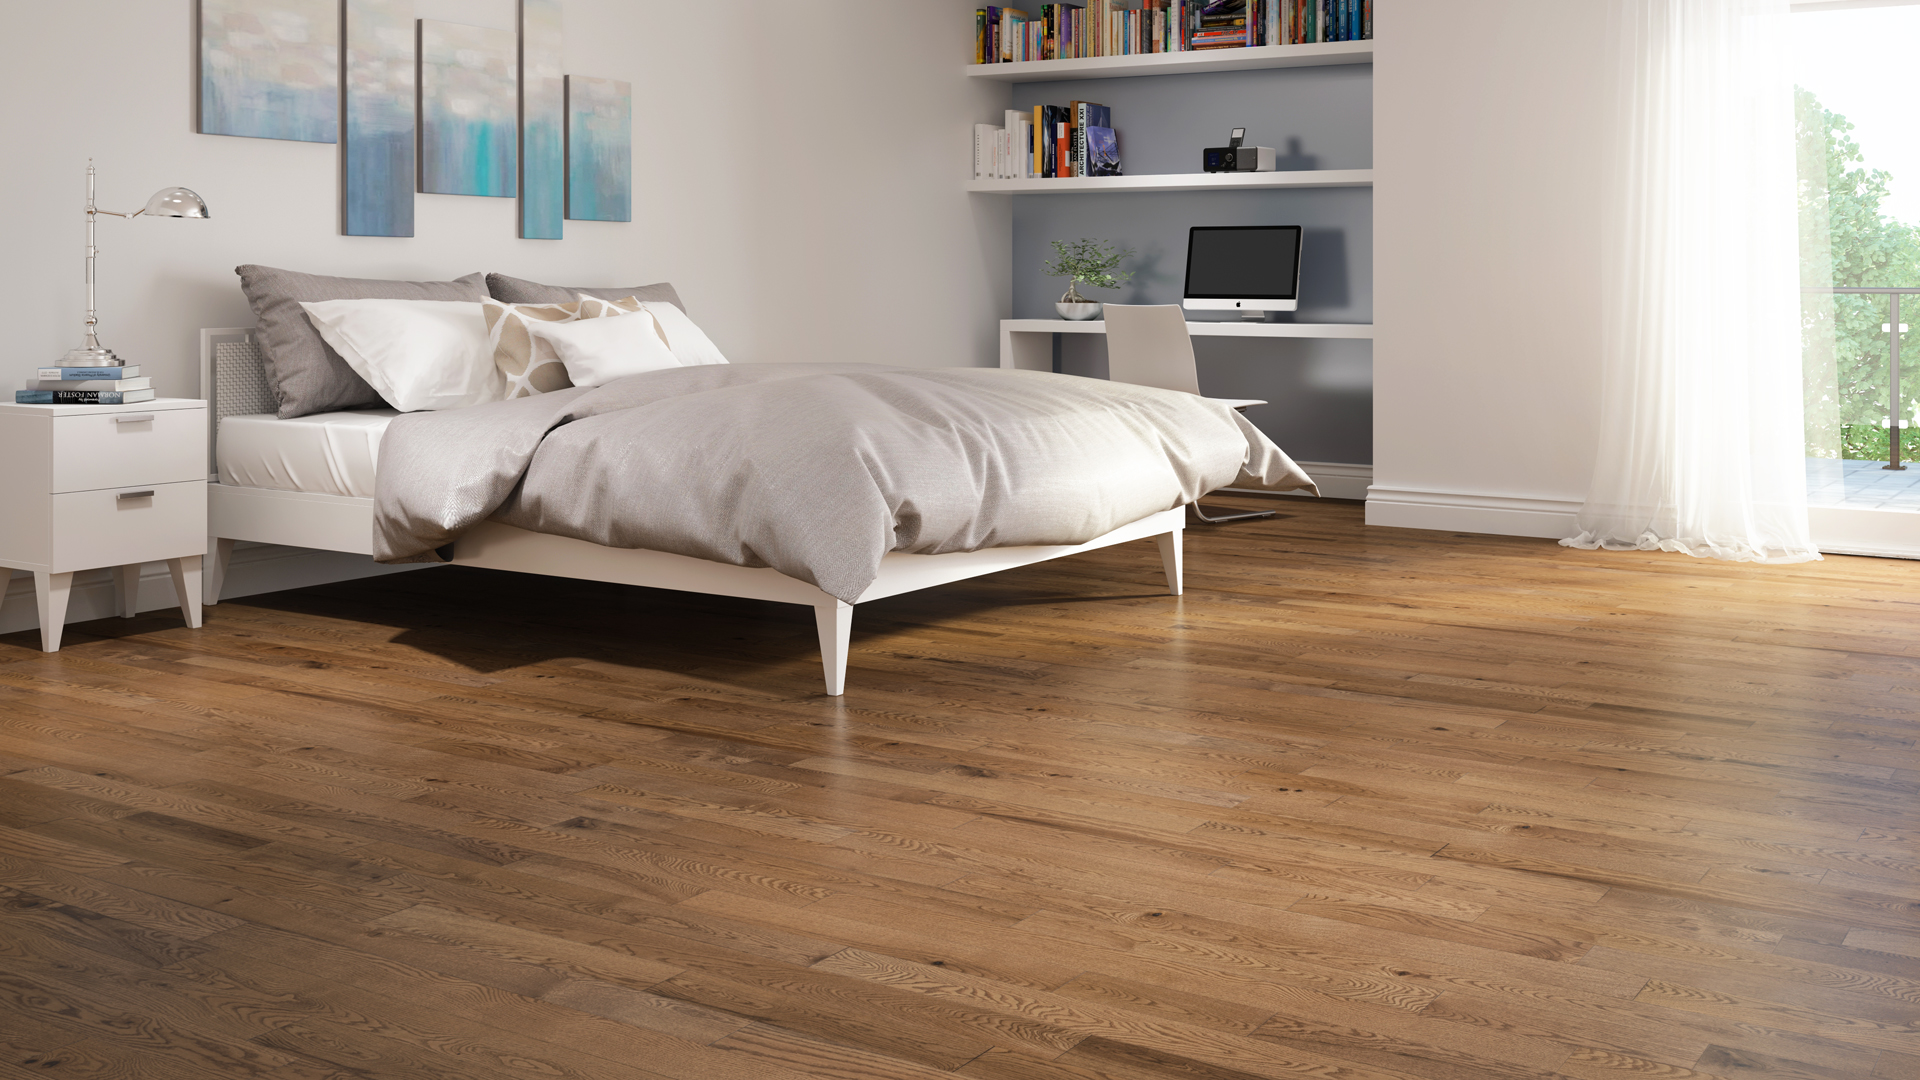 Red oak apricot | Dubeau hardwood floors | Bedroom decor